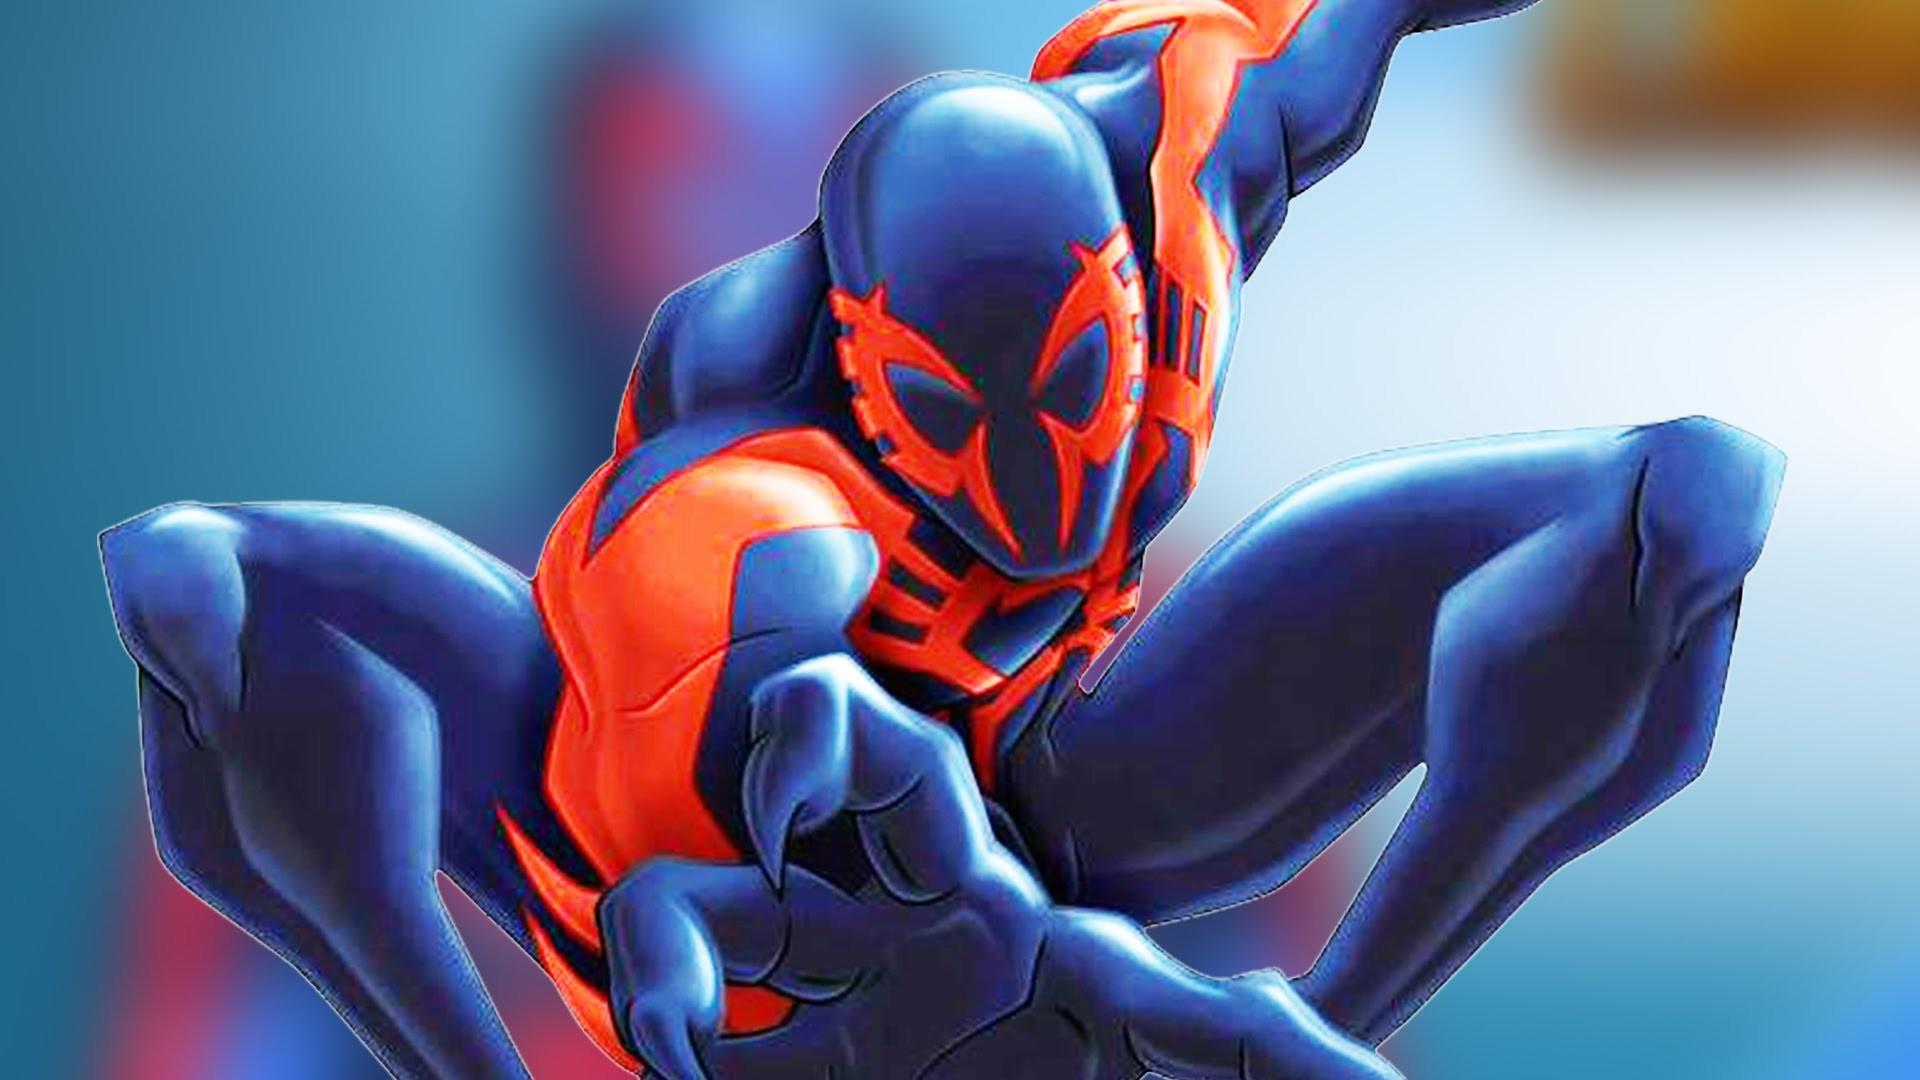 Marvel: Avengers Academy – 5-Star Spider-Man 2099 Rank Up!